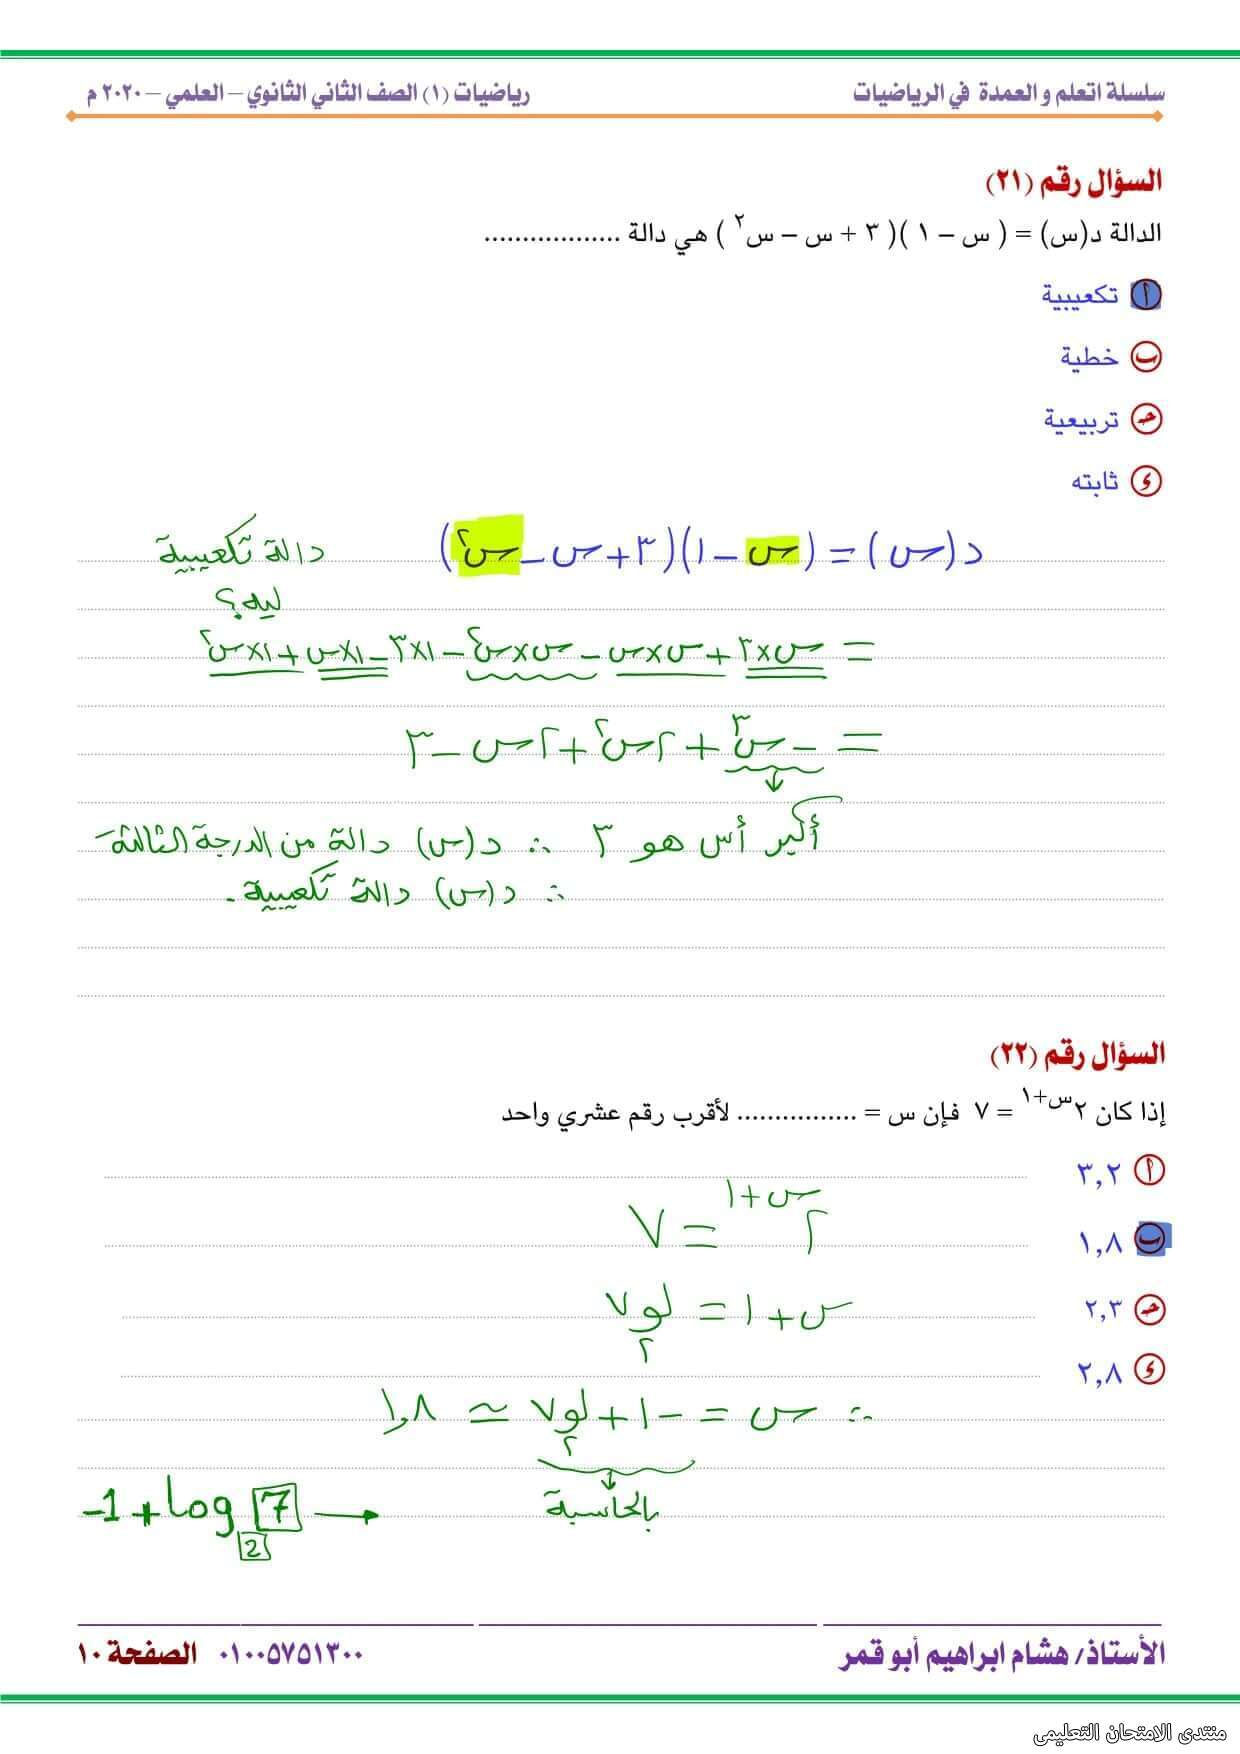 exam-eg.com_161444094965729.jpg